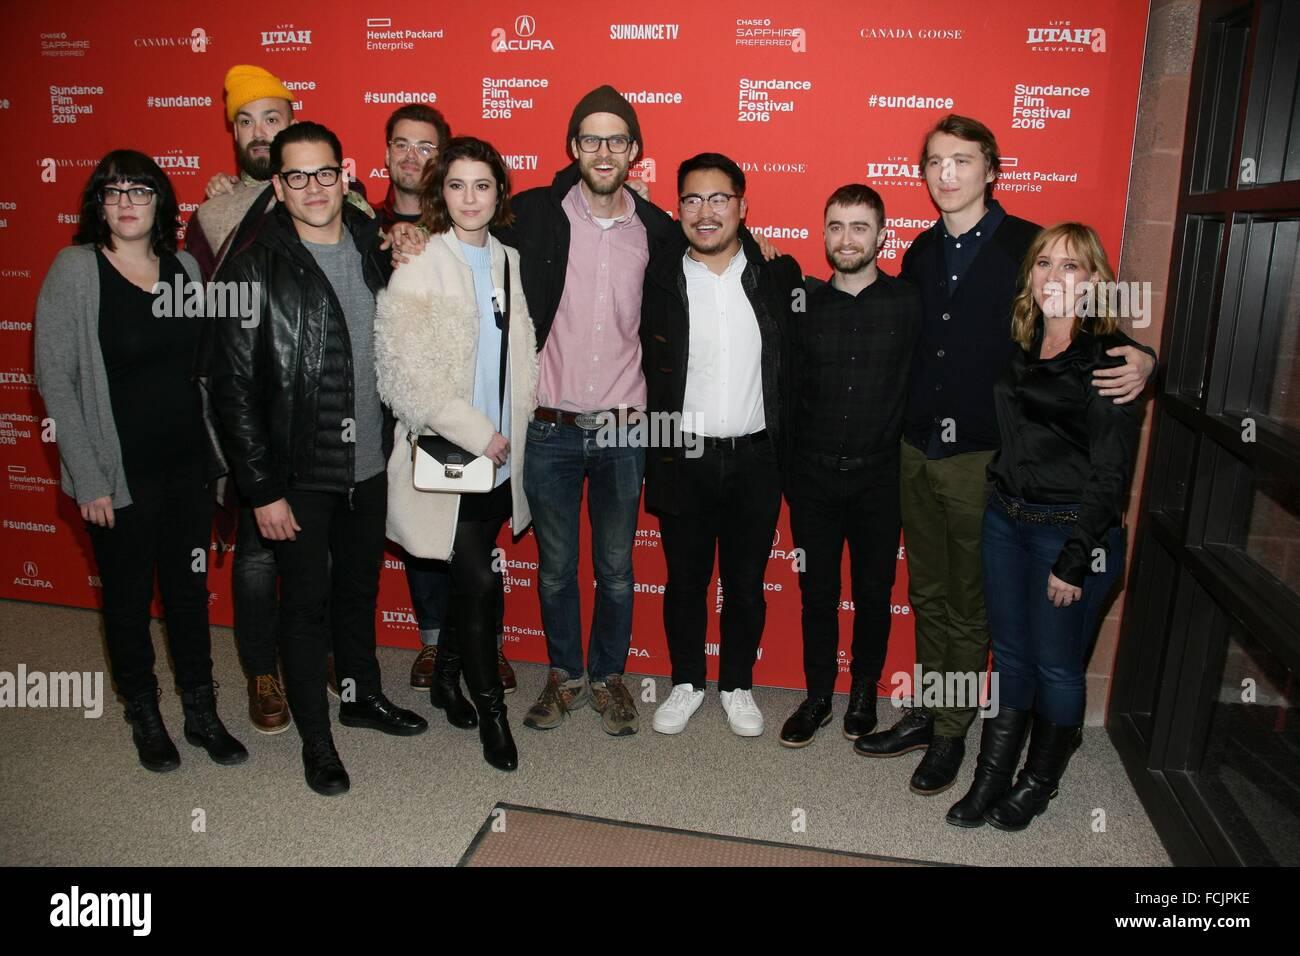 Park City, UT, USA. 22. Januar 2016. Mary Elizabeth Winstead, Daniel Scheinert, Dan Kwan, Daniel Radcliffe, Paul Stockbild